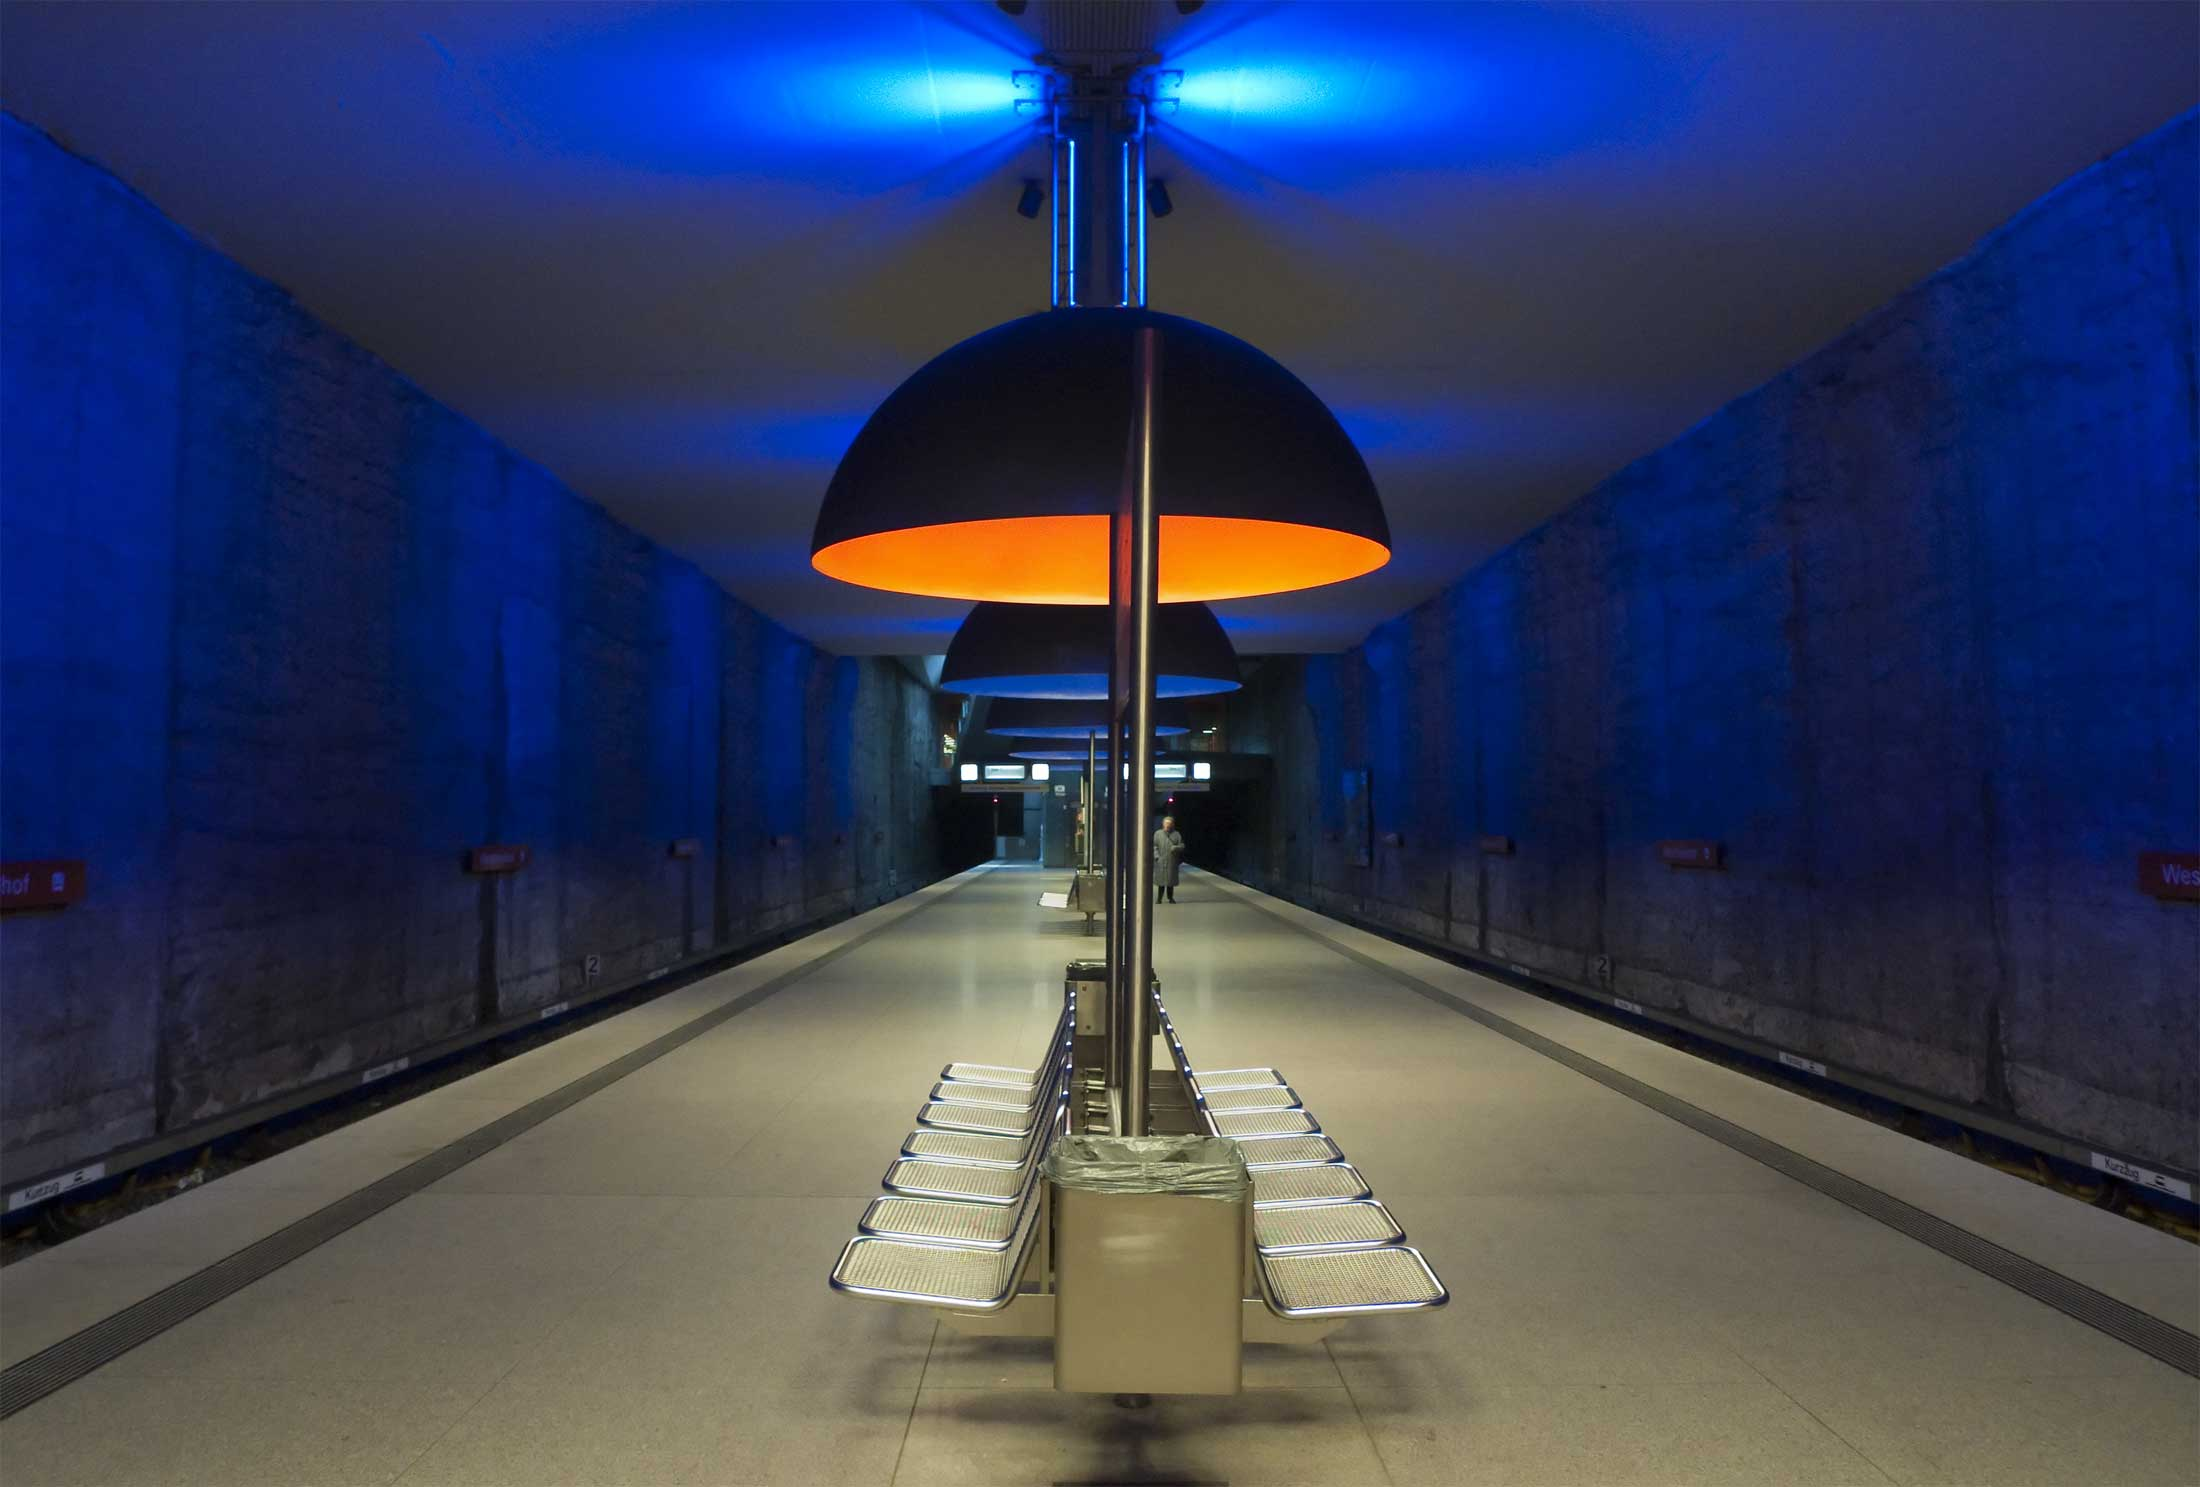 fichier munich subway westfriedhof u1 jpg wikip dia. Black Bedroom Furniture Sets. Home Design Ideas